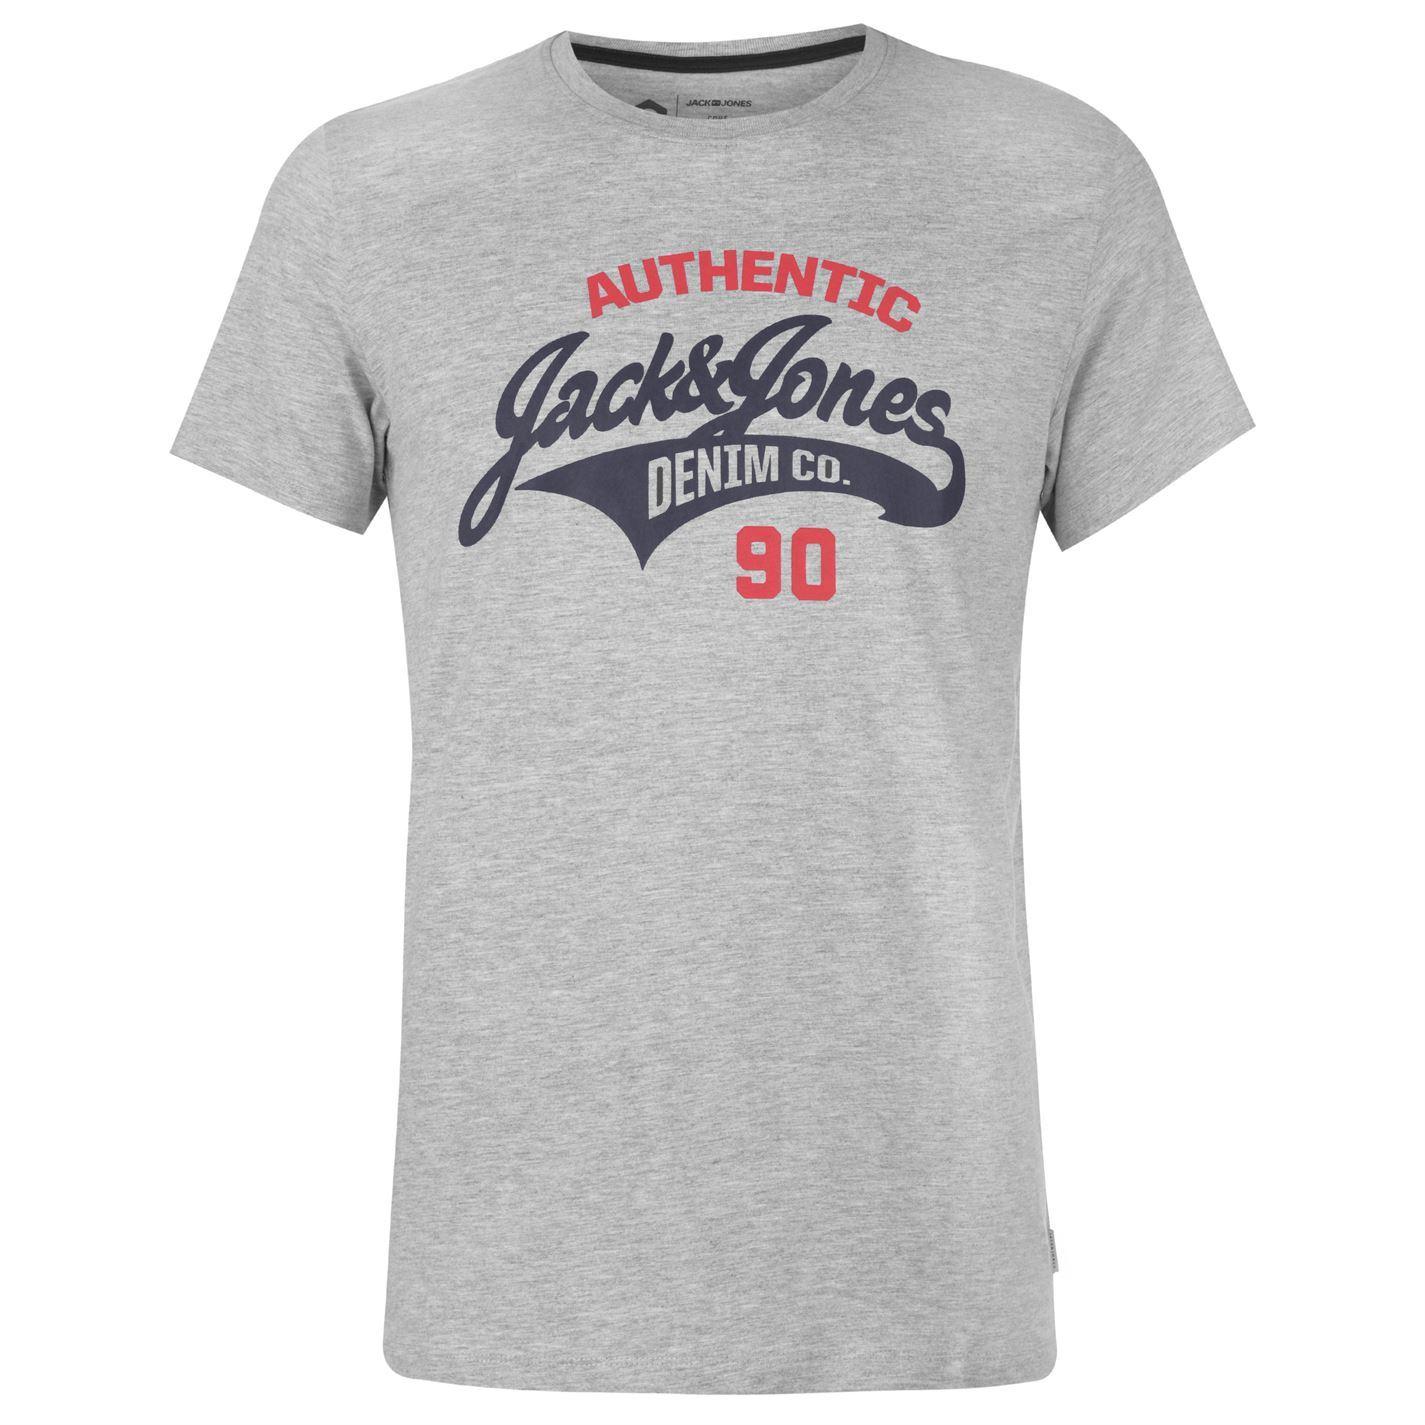 Jack-and-Jones-Core-Heritage-Logo-T-Shirt-Mens-Tee-Shirt-Top thumbnail 4